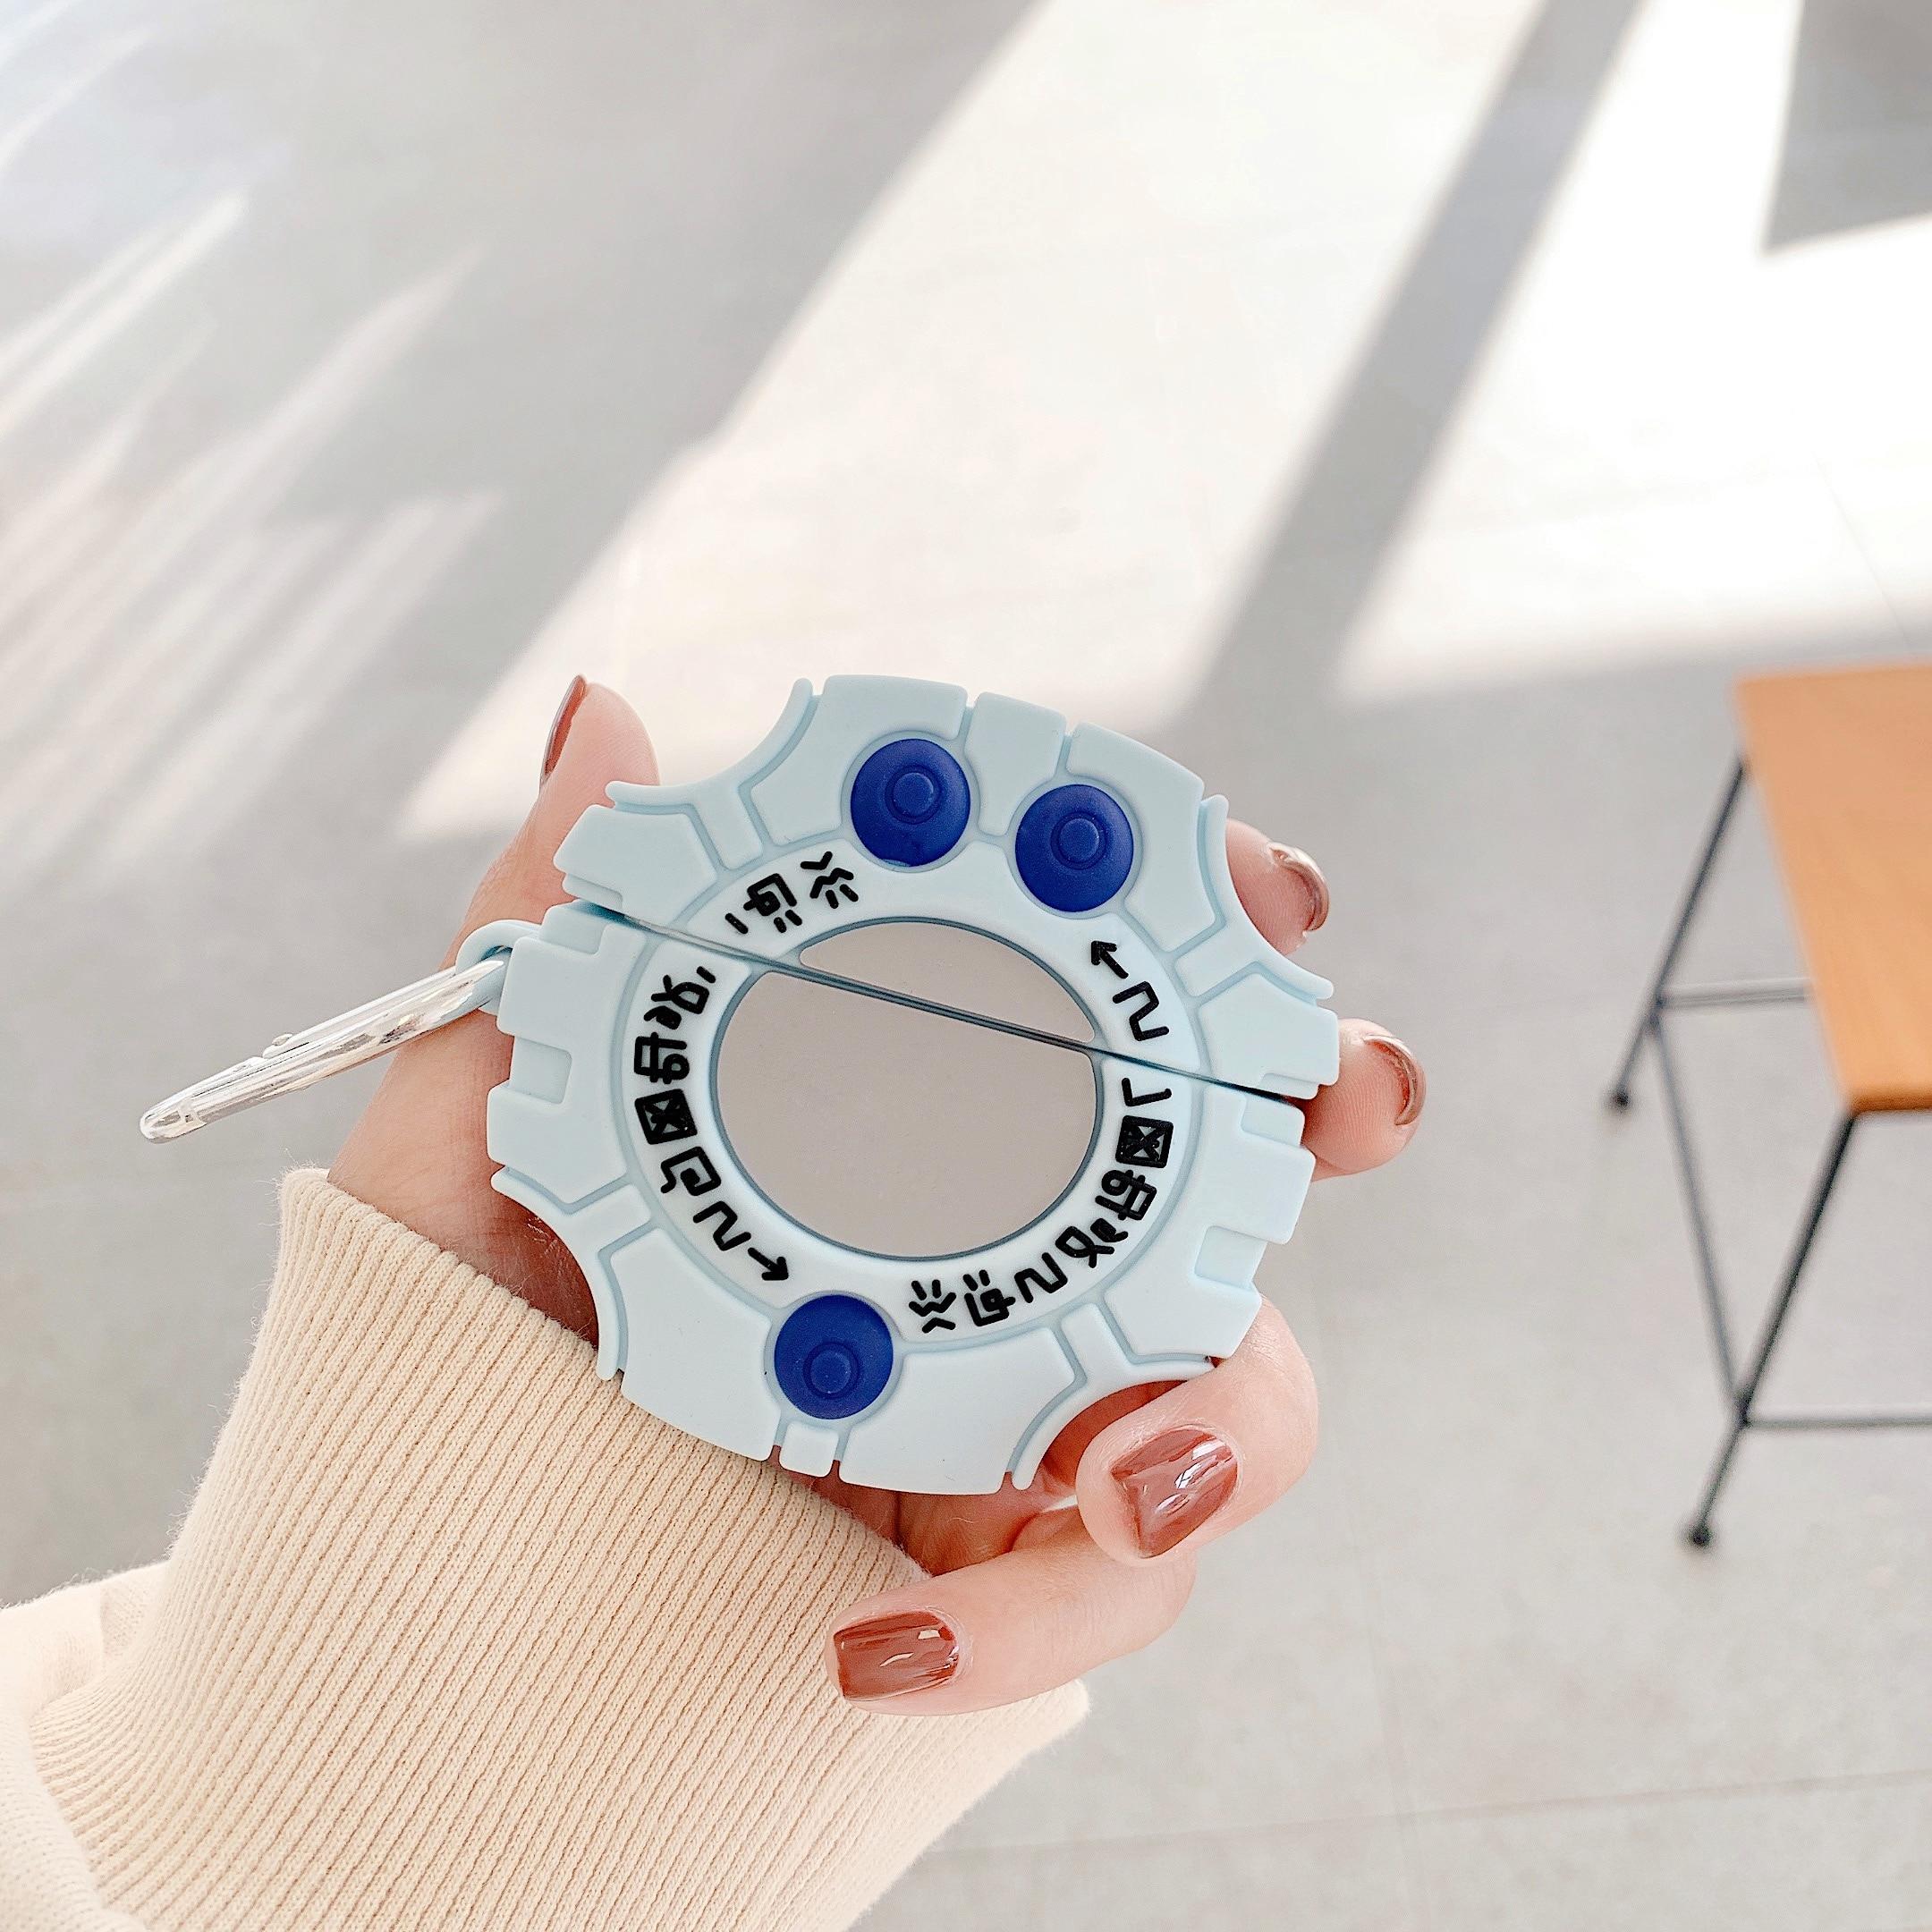 Funda de silicona 3D Dinimon Monster Digivice para auriculares Airpods 1 2, funda para auriculares inalámbricos Bluetooth, funda para Airpod Pro 3